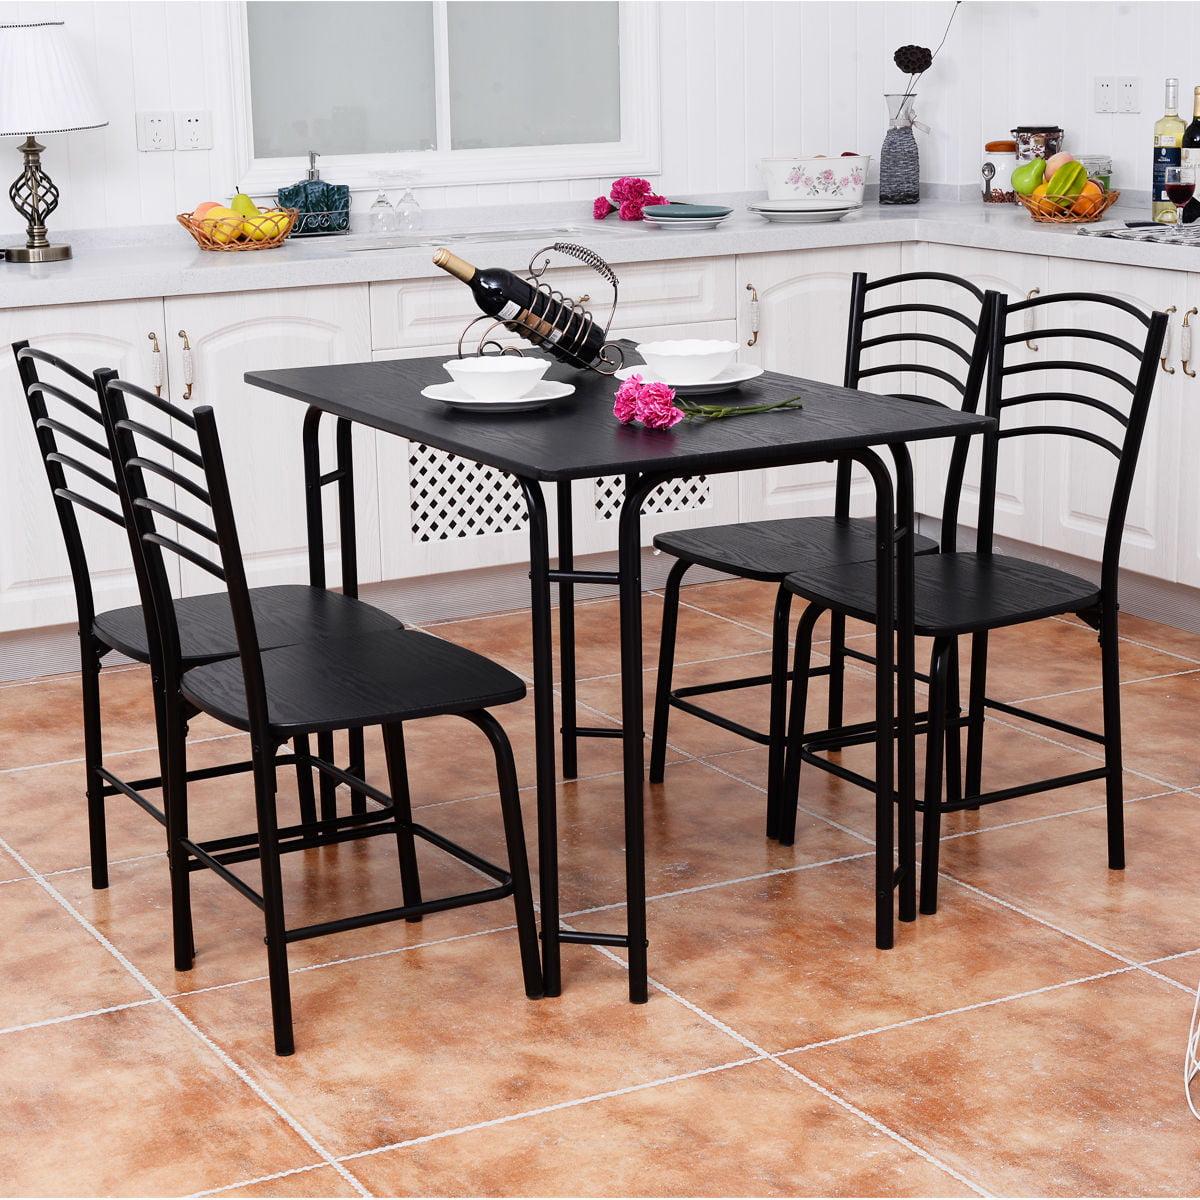 5 pcs modern dining table set 4 chairs steel frame home kitchen furniture black walmart com